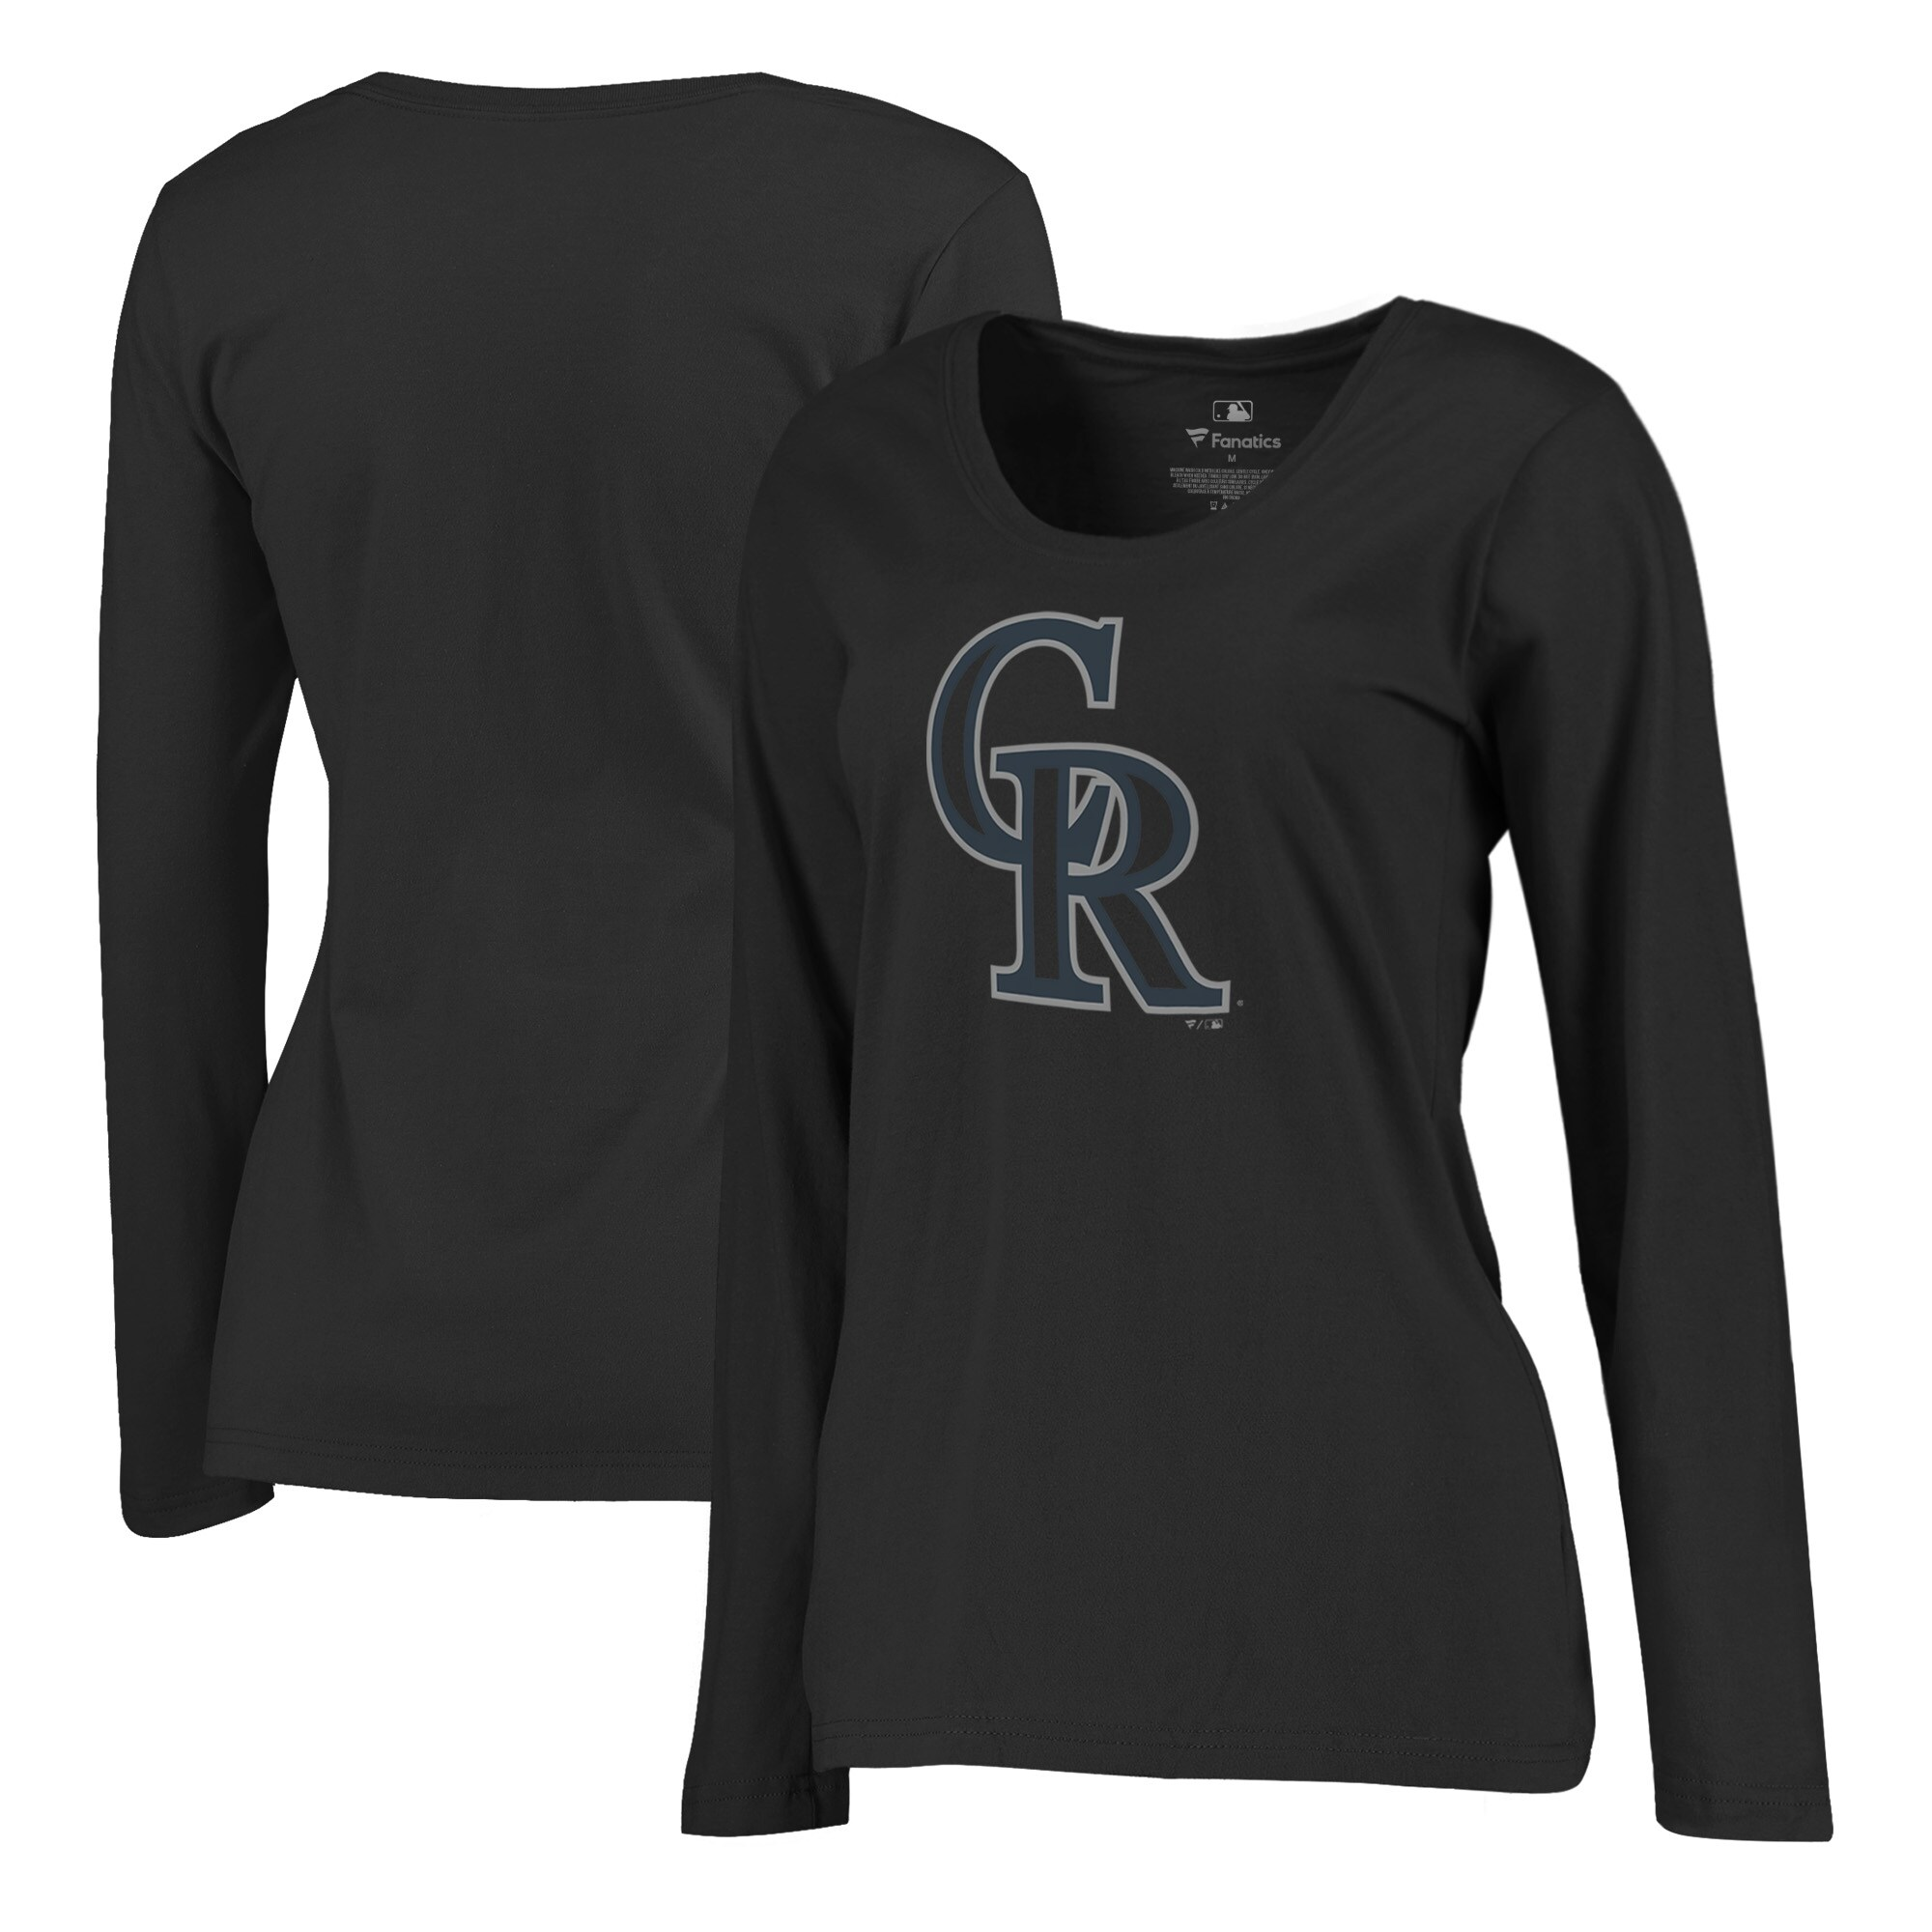 Colorado Rockies Fanatics Branded Women's Taylor Plus Size Long Sleeve T-Shirt - Black